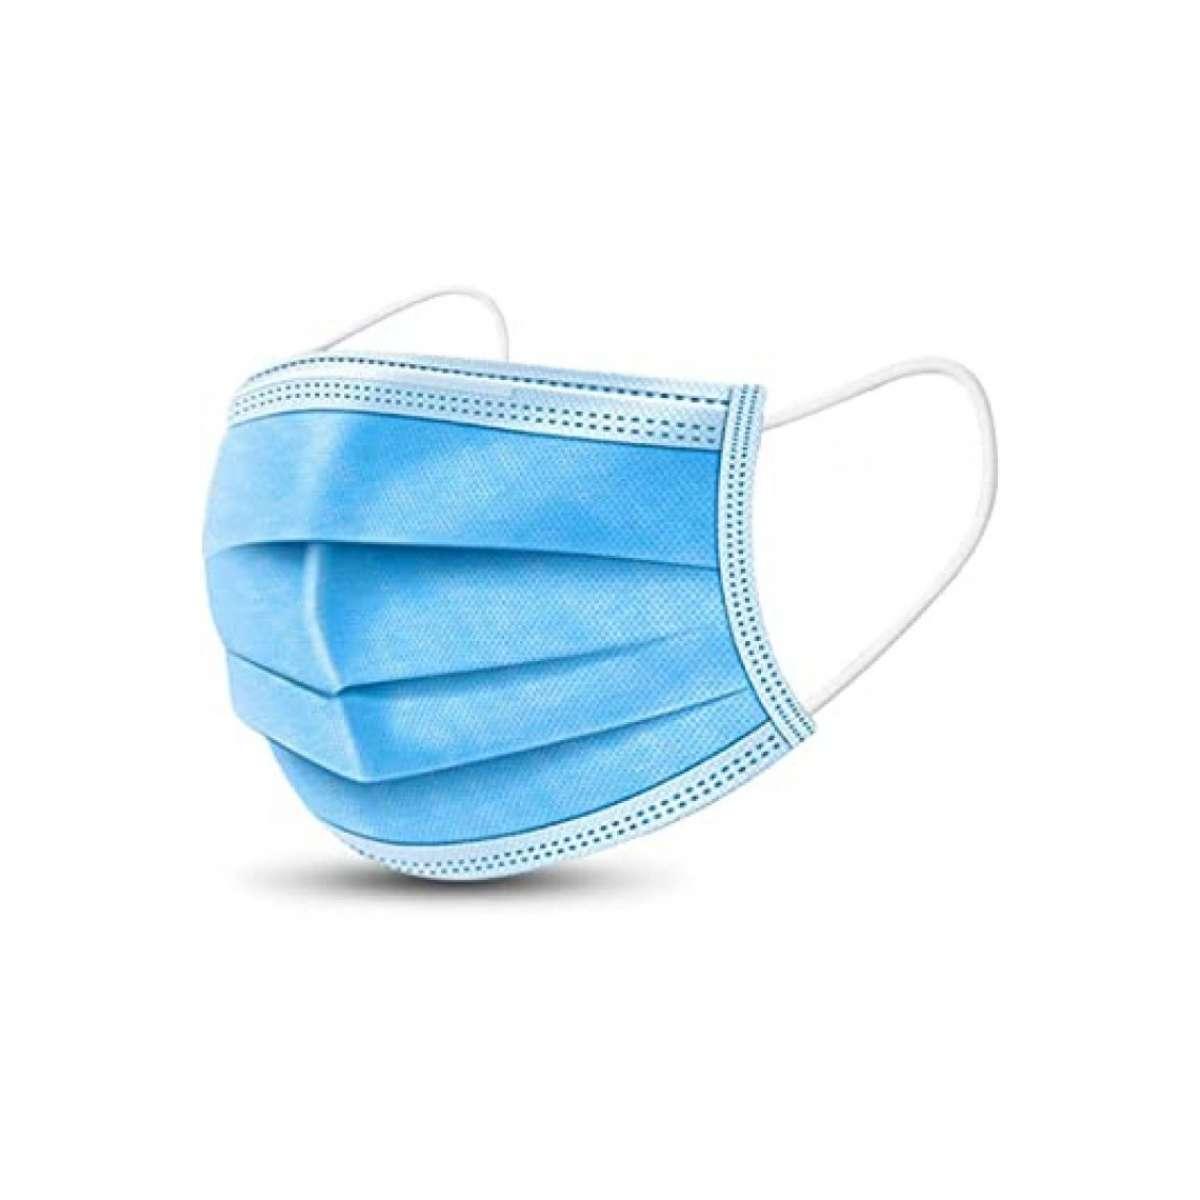 Medical Disposable Mask FDA (EarLoop) - Box of 50